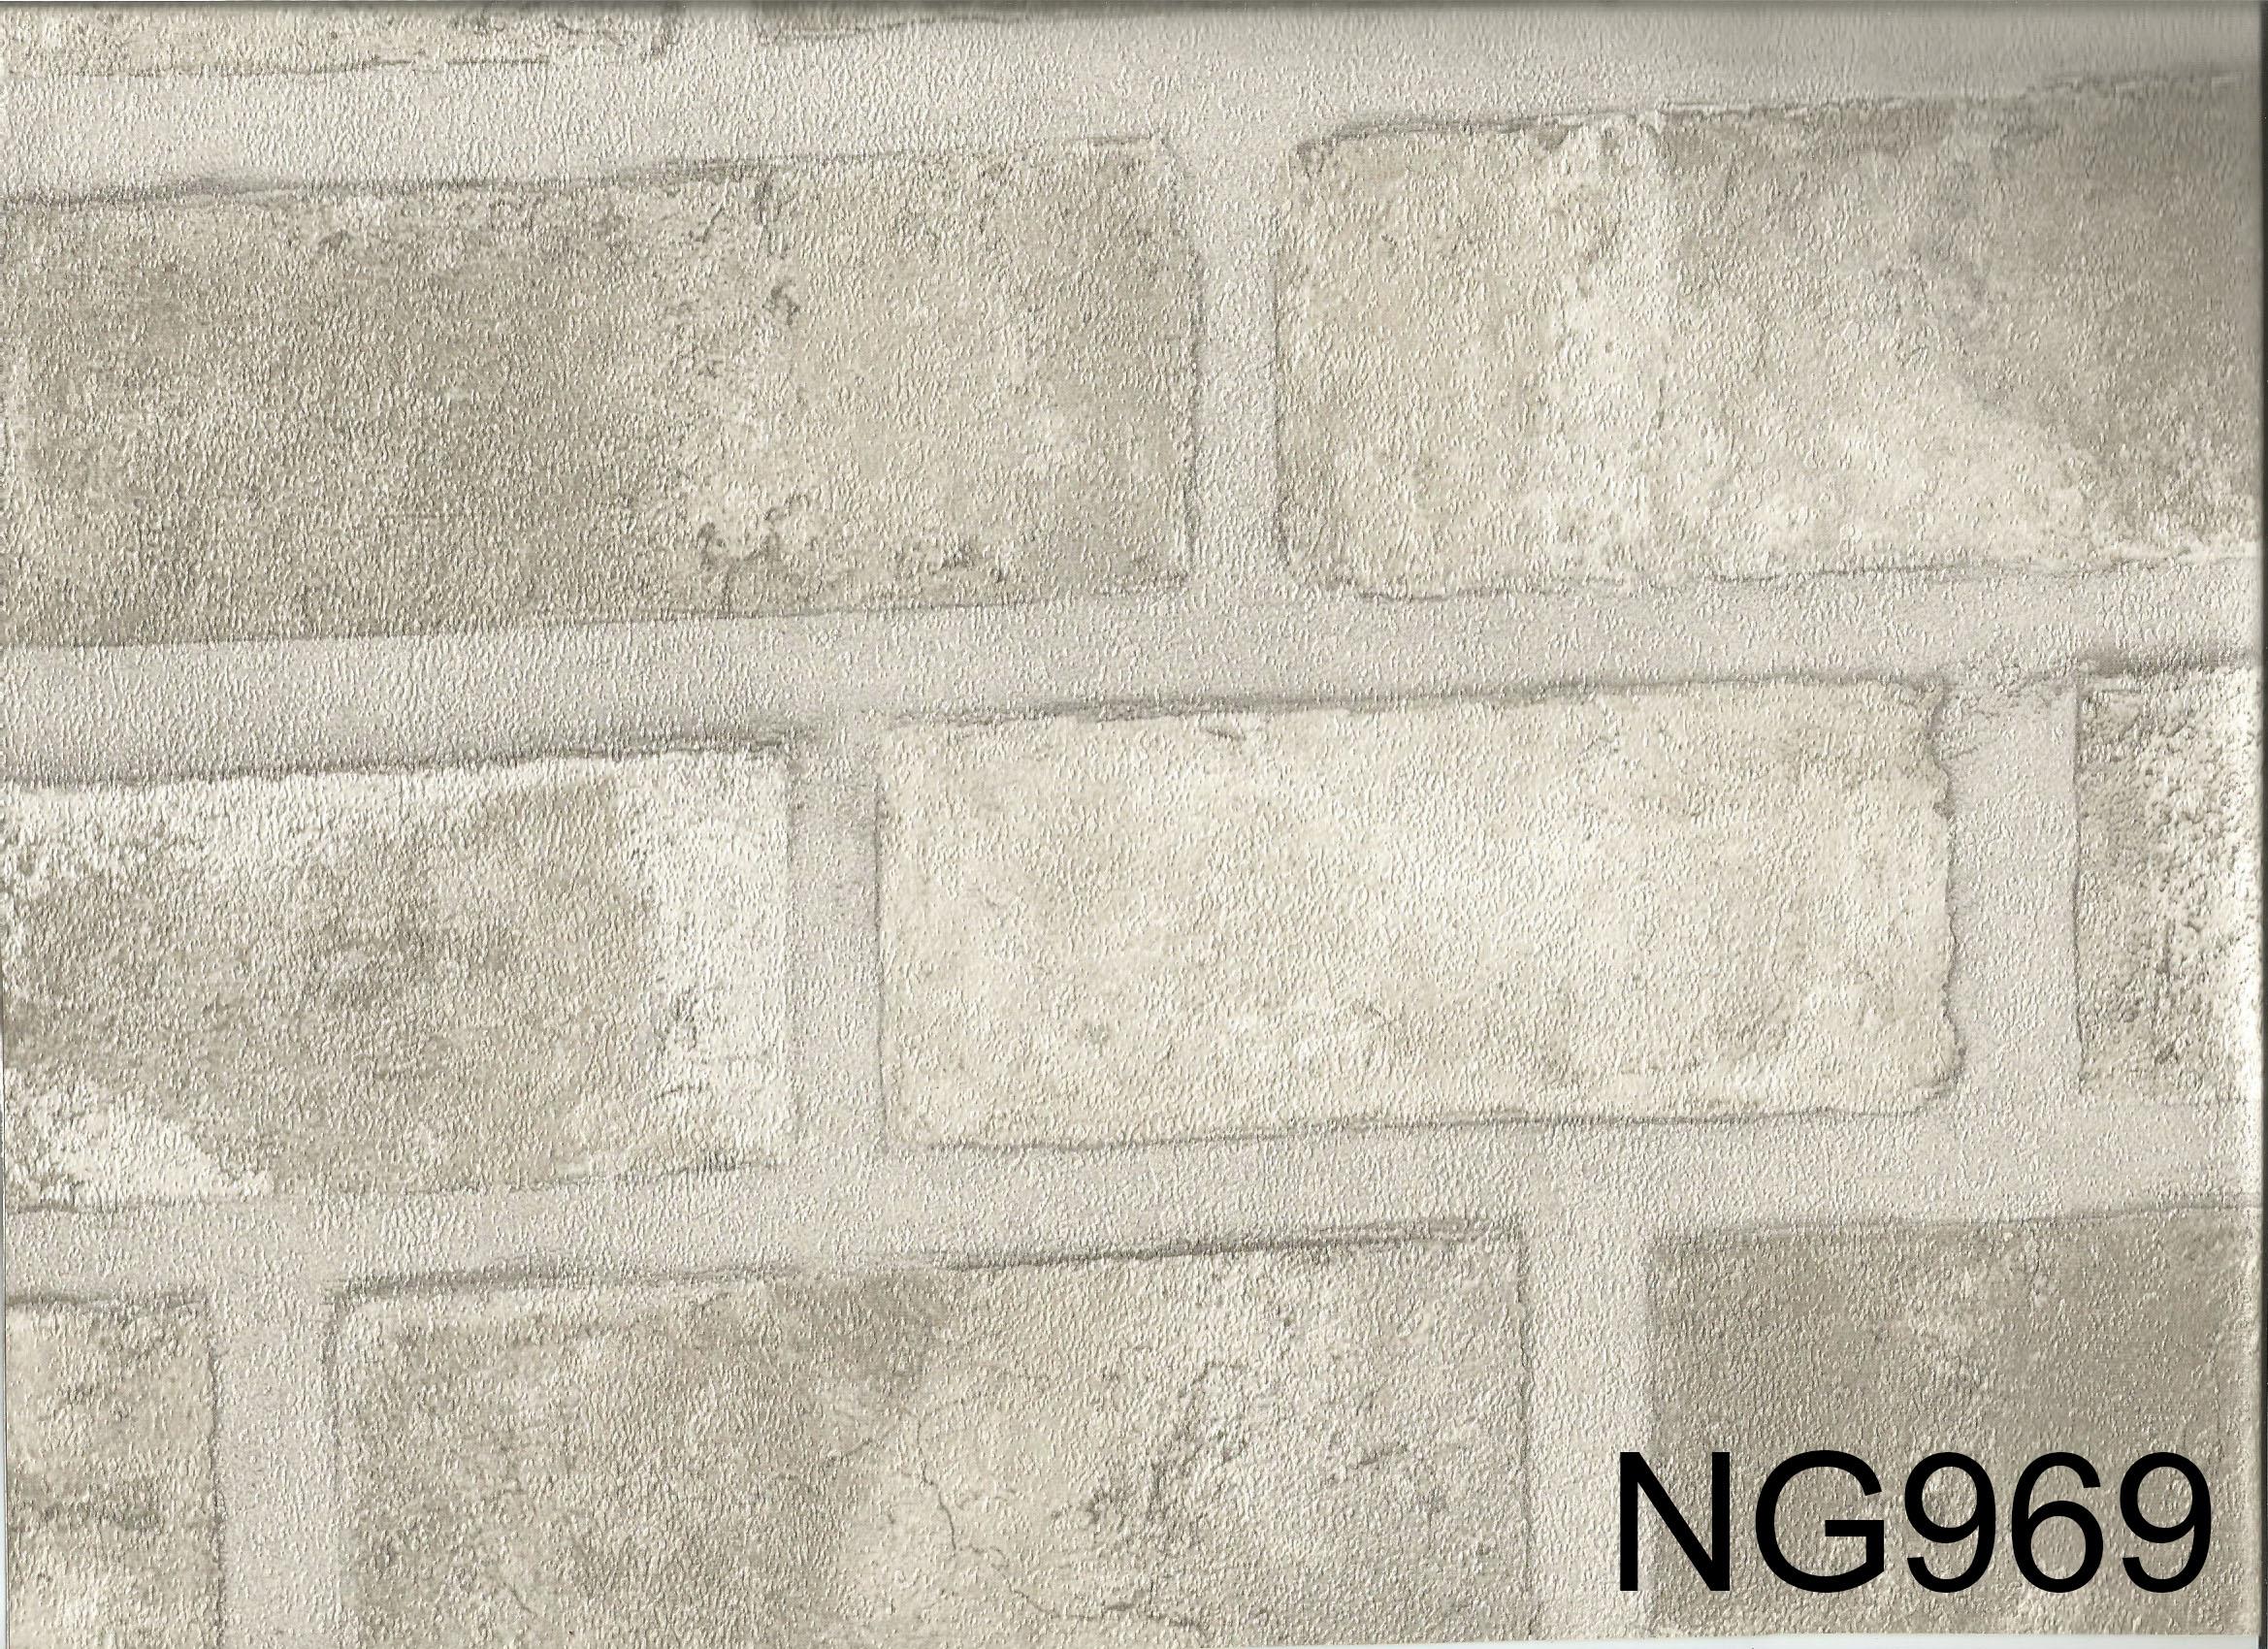 NG969